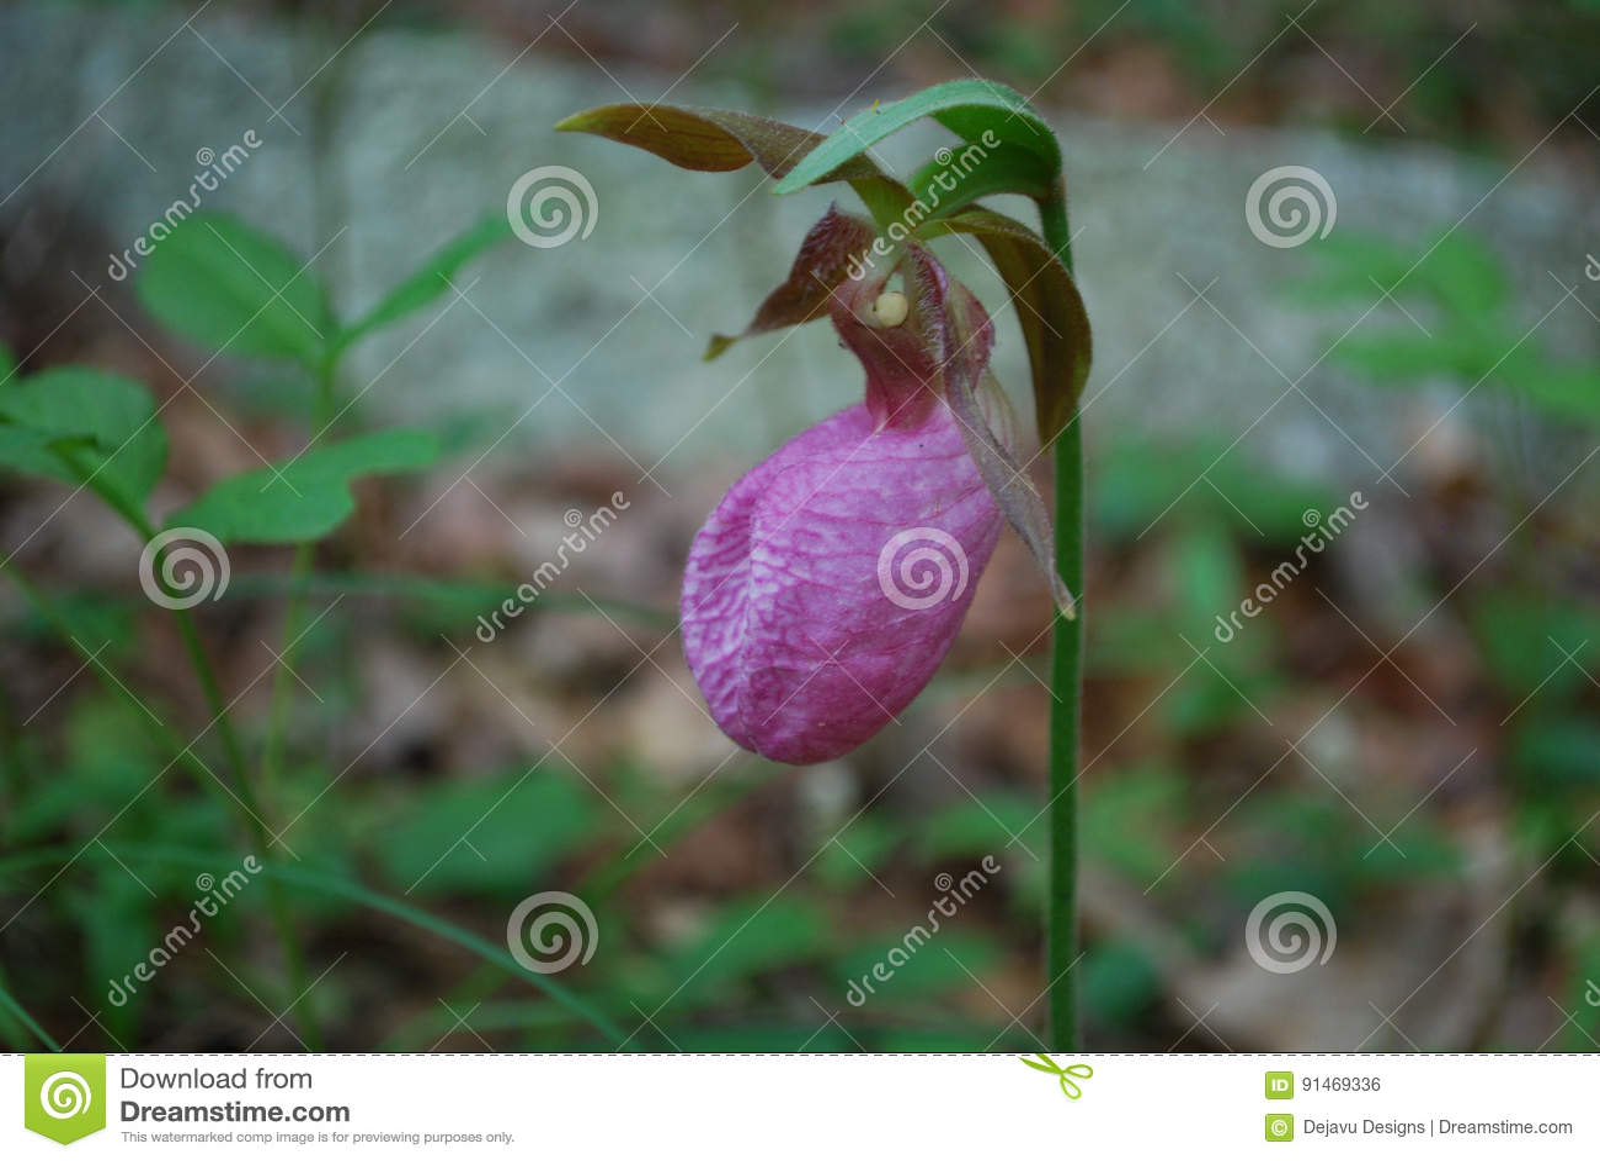 Flowering Pink Ladies Slipper Flower Blossom In The Wild Stock Photo